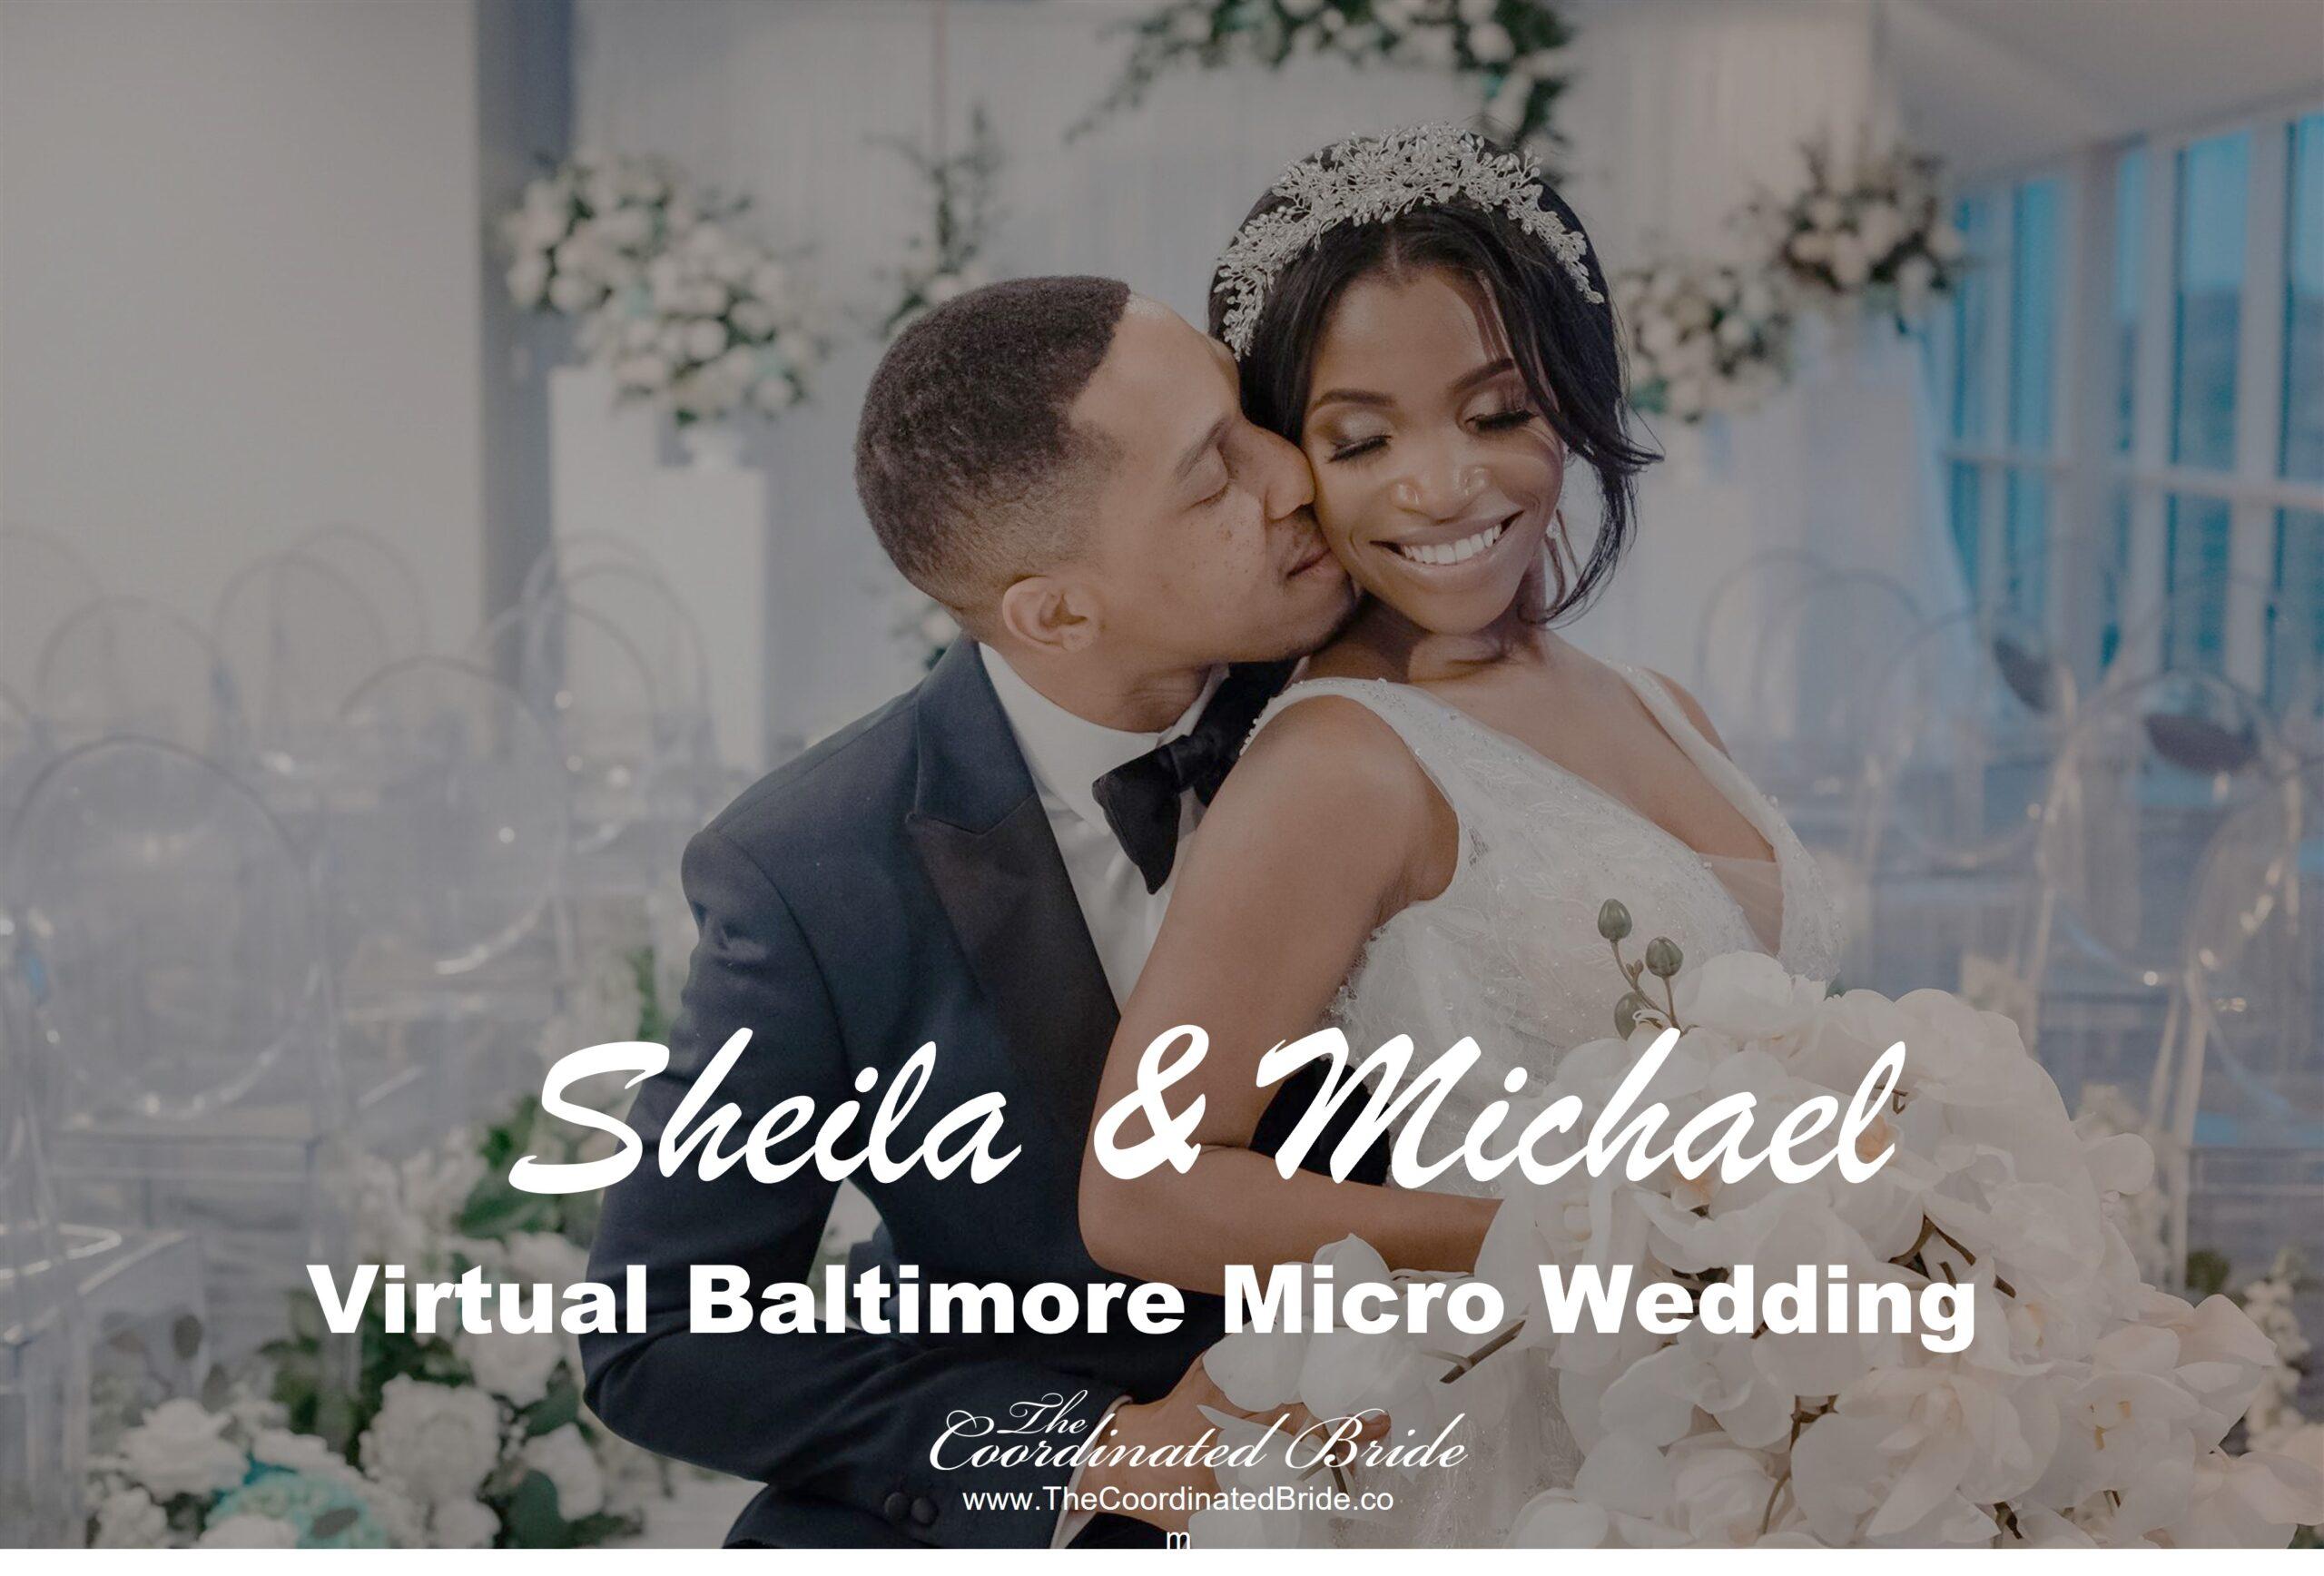 An Intimate Virtual Micro Wedding Overlooking the  Baltimore Harbor